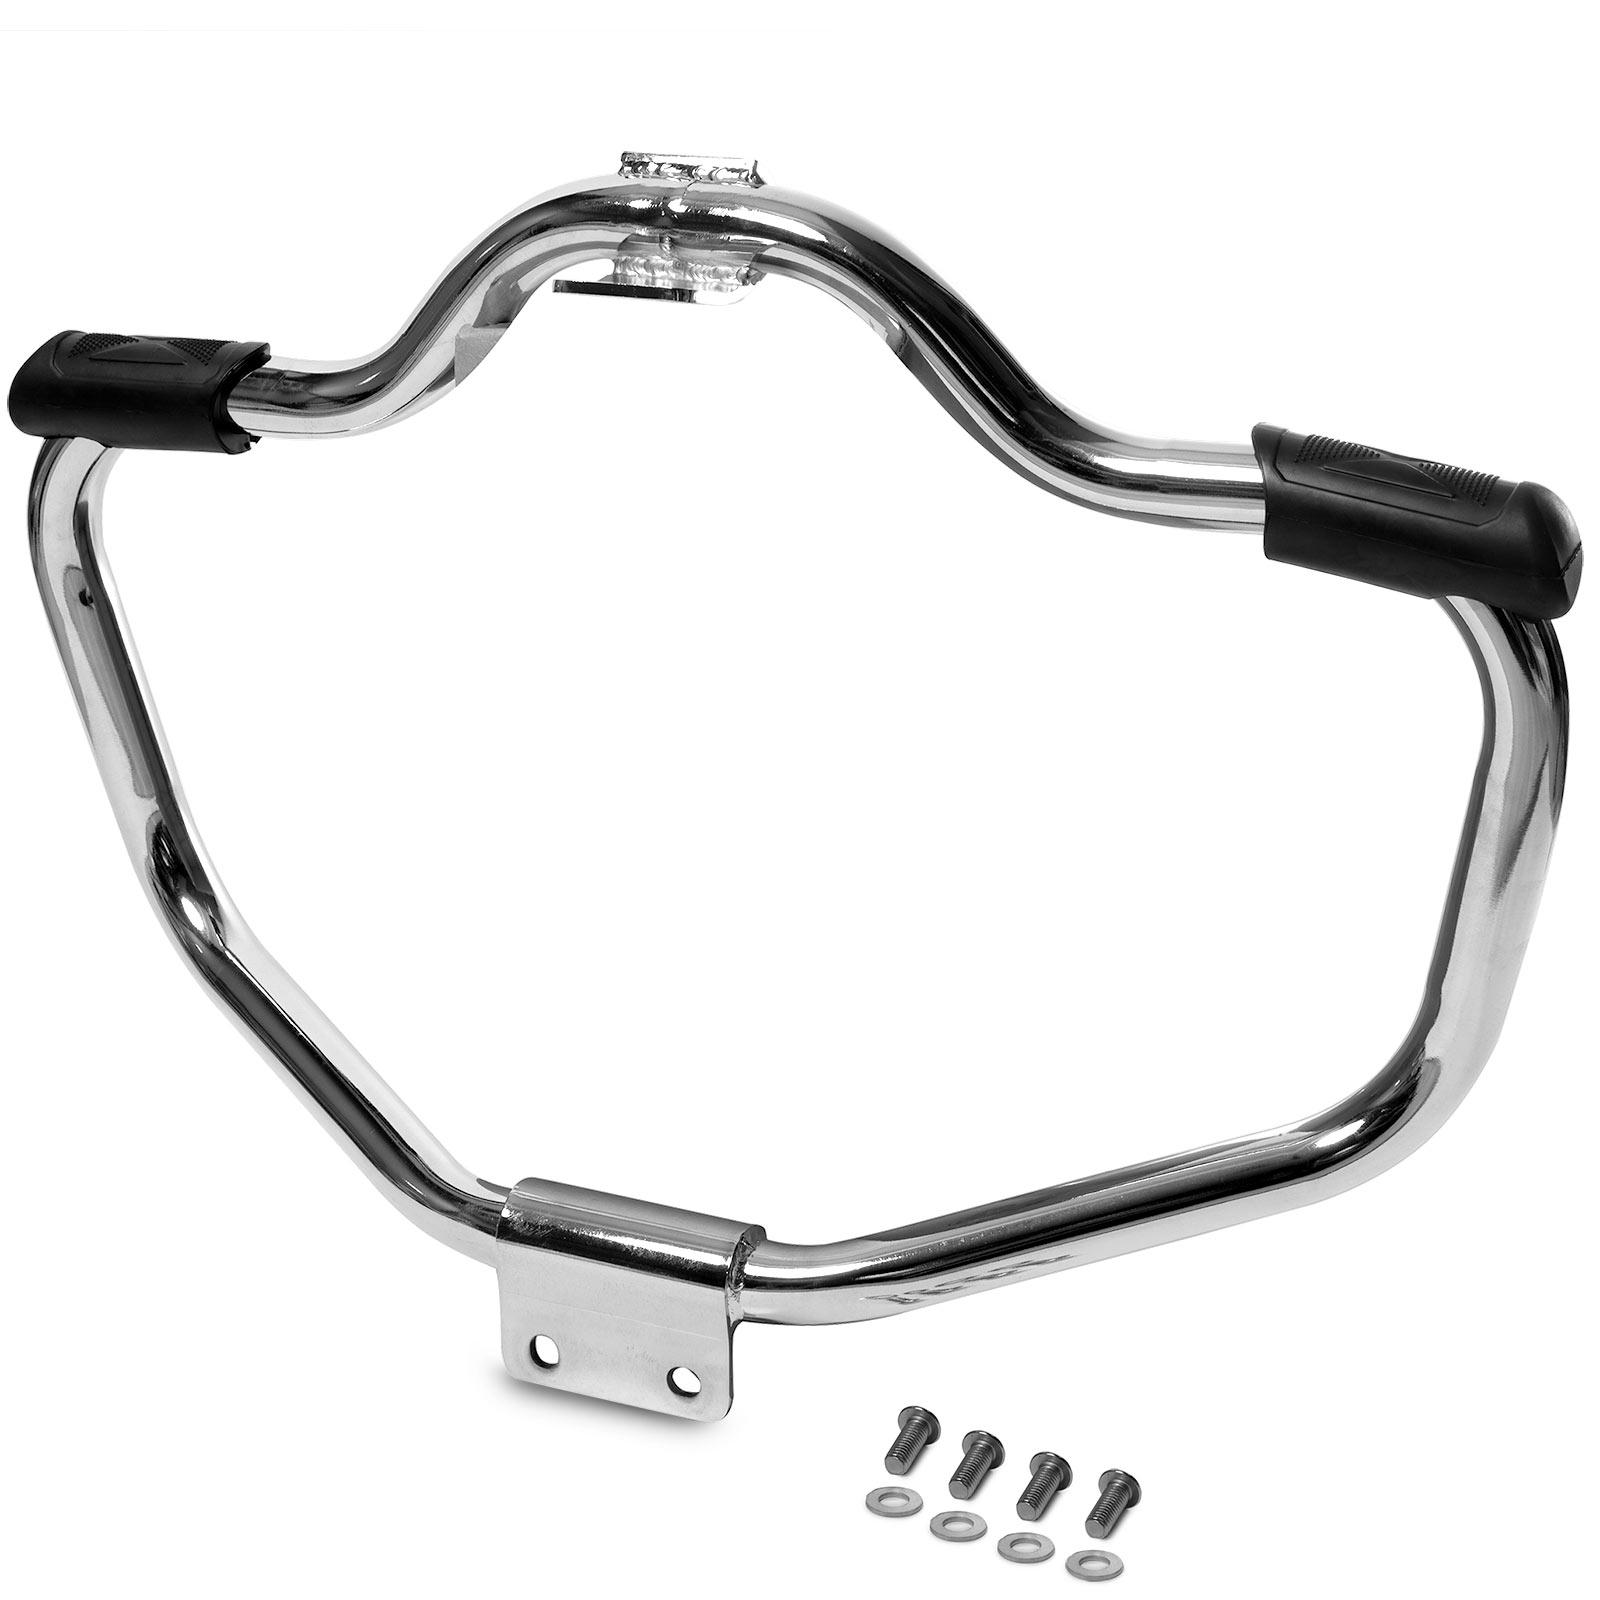 Krator Engine Guard Highway Mustache Crash Bar Compatible with Harley Davidson Sportster 1200 883 XL 2004-2020 and XR 1200 2008-2013 Black